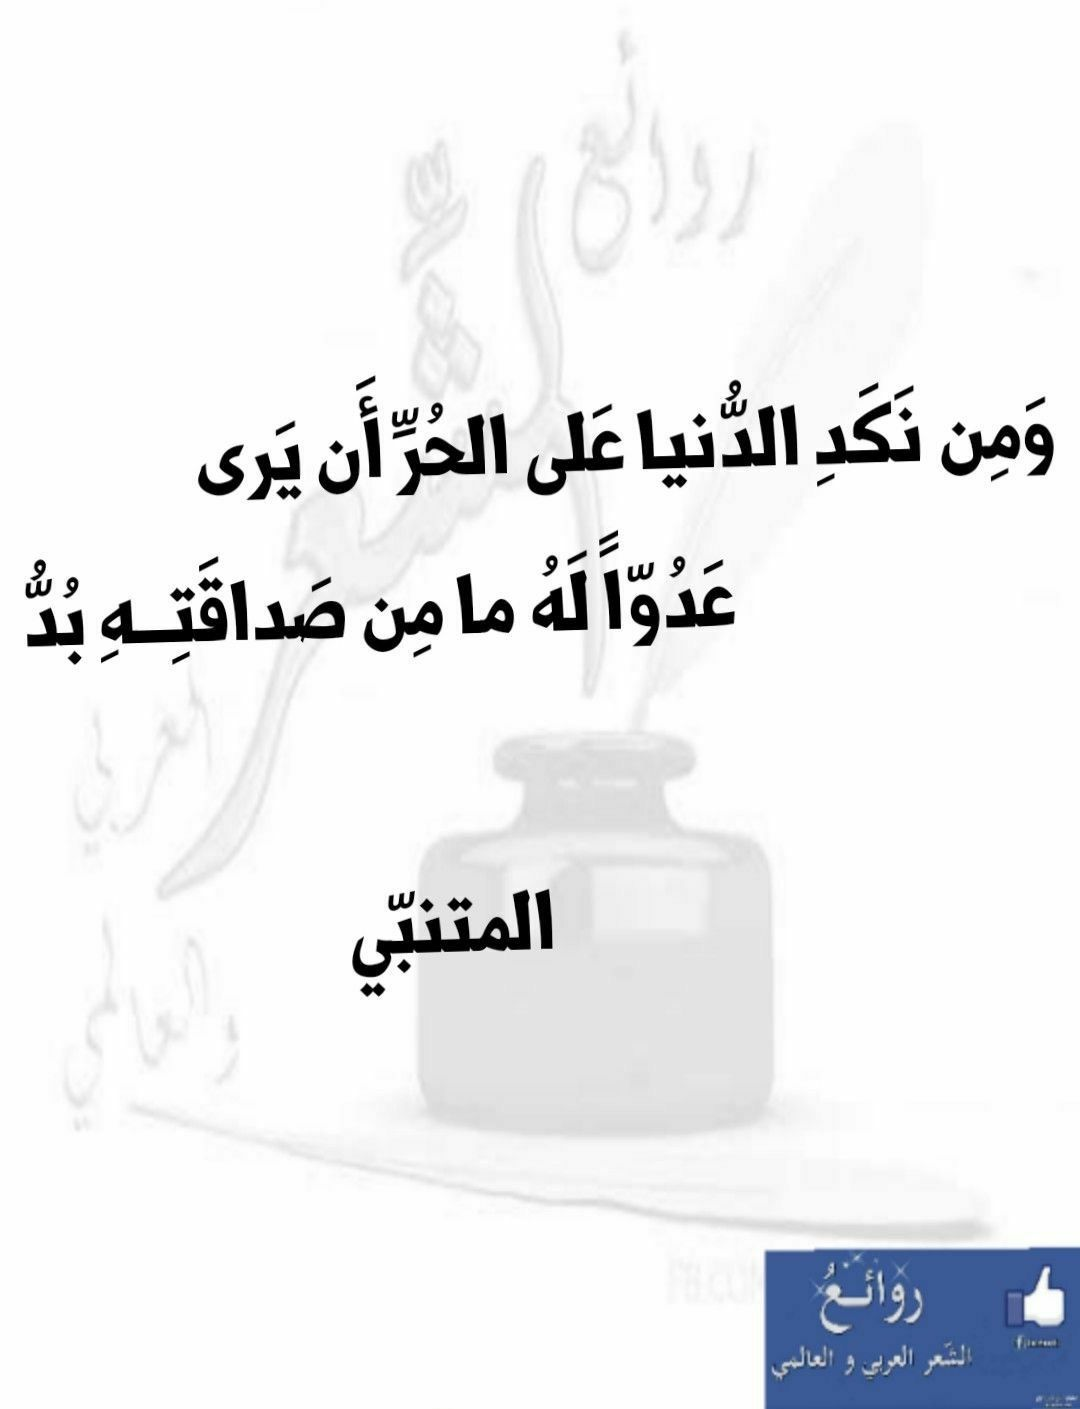 Pin By Beti Diaz On Poème Arabe Arabic Quotes Arabic